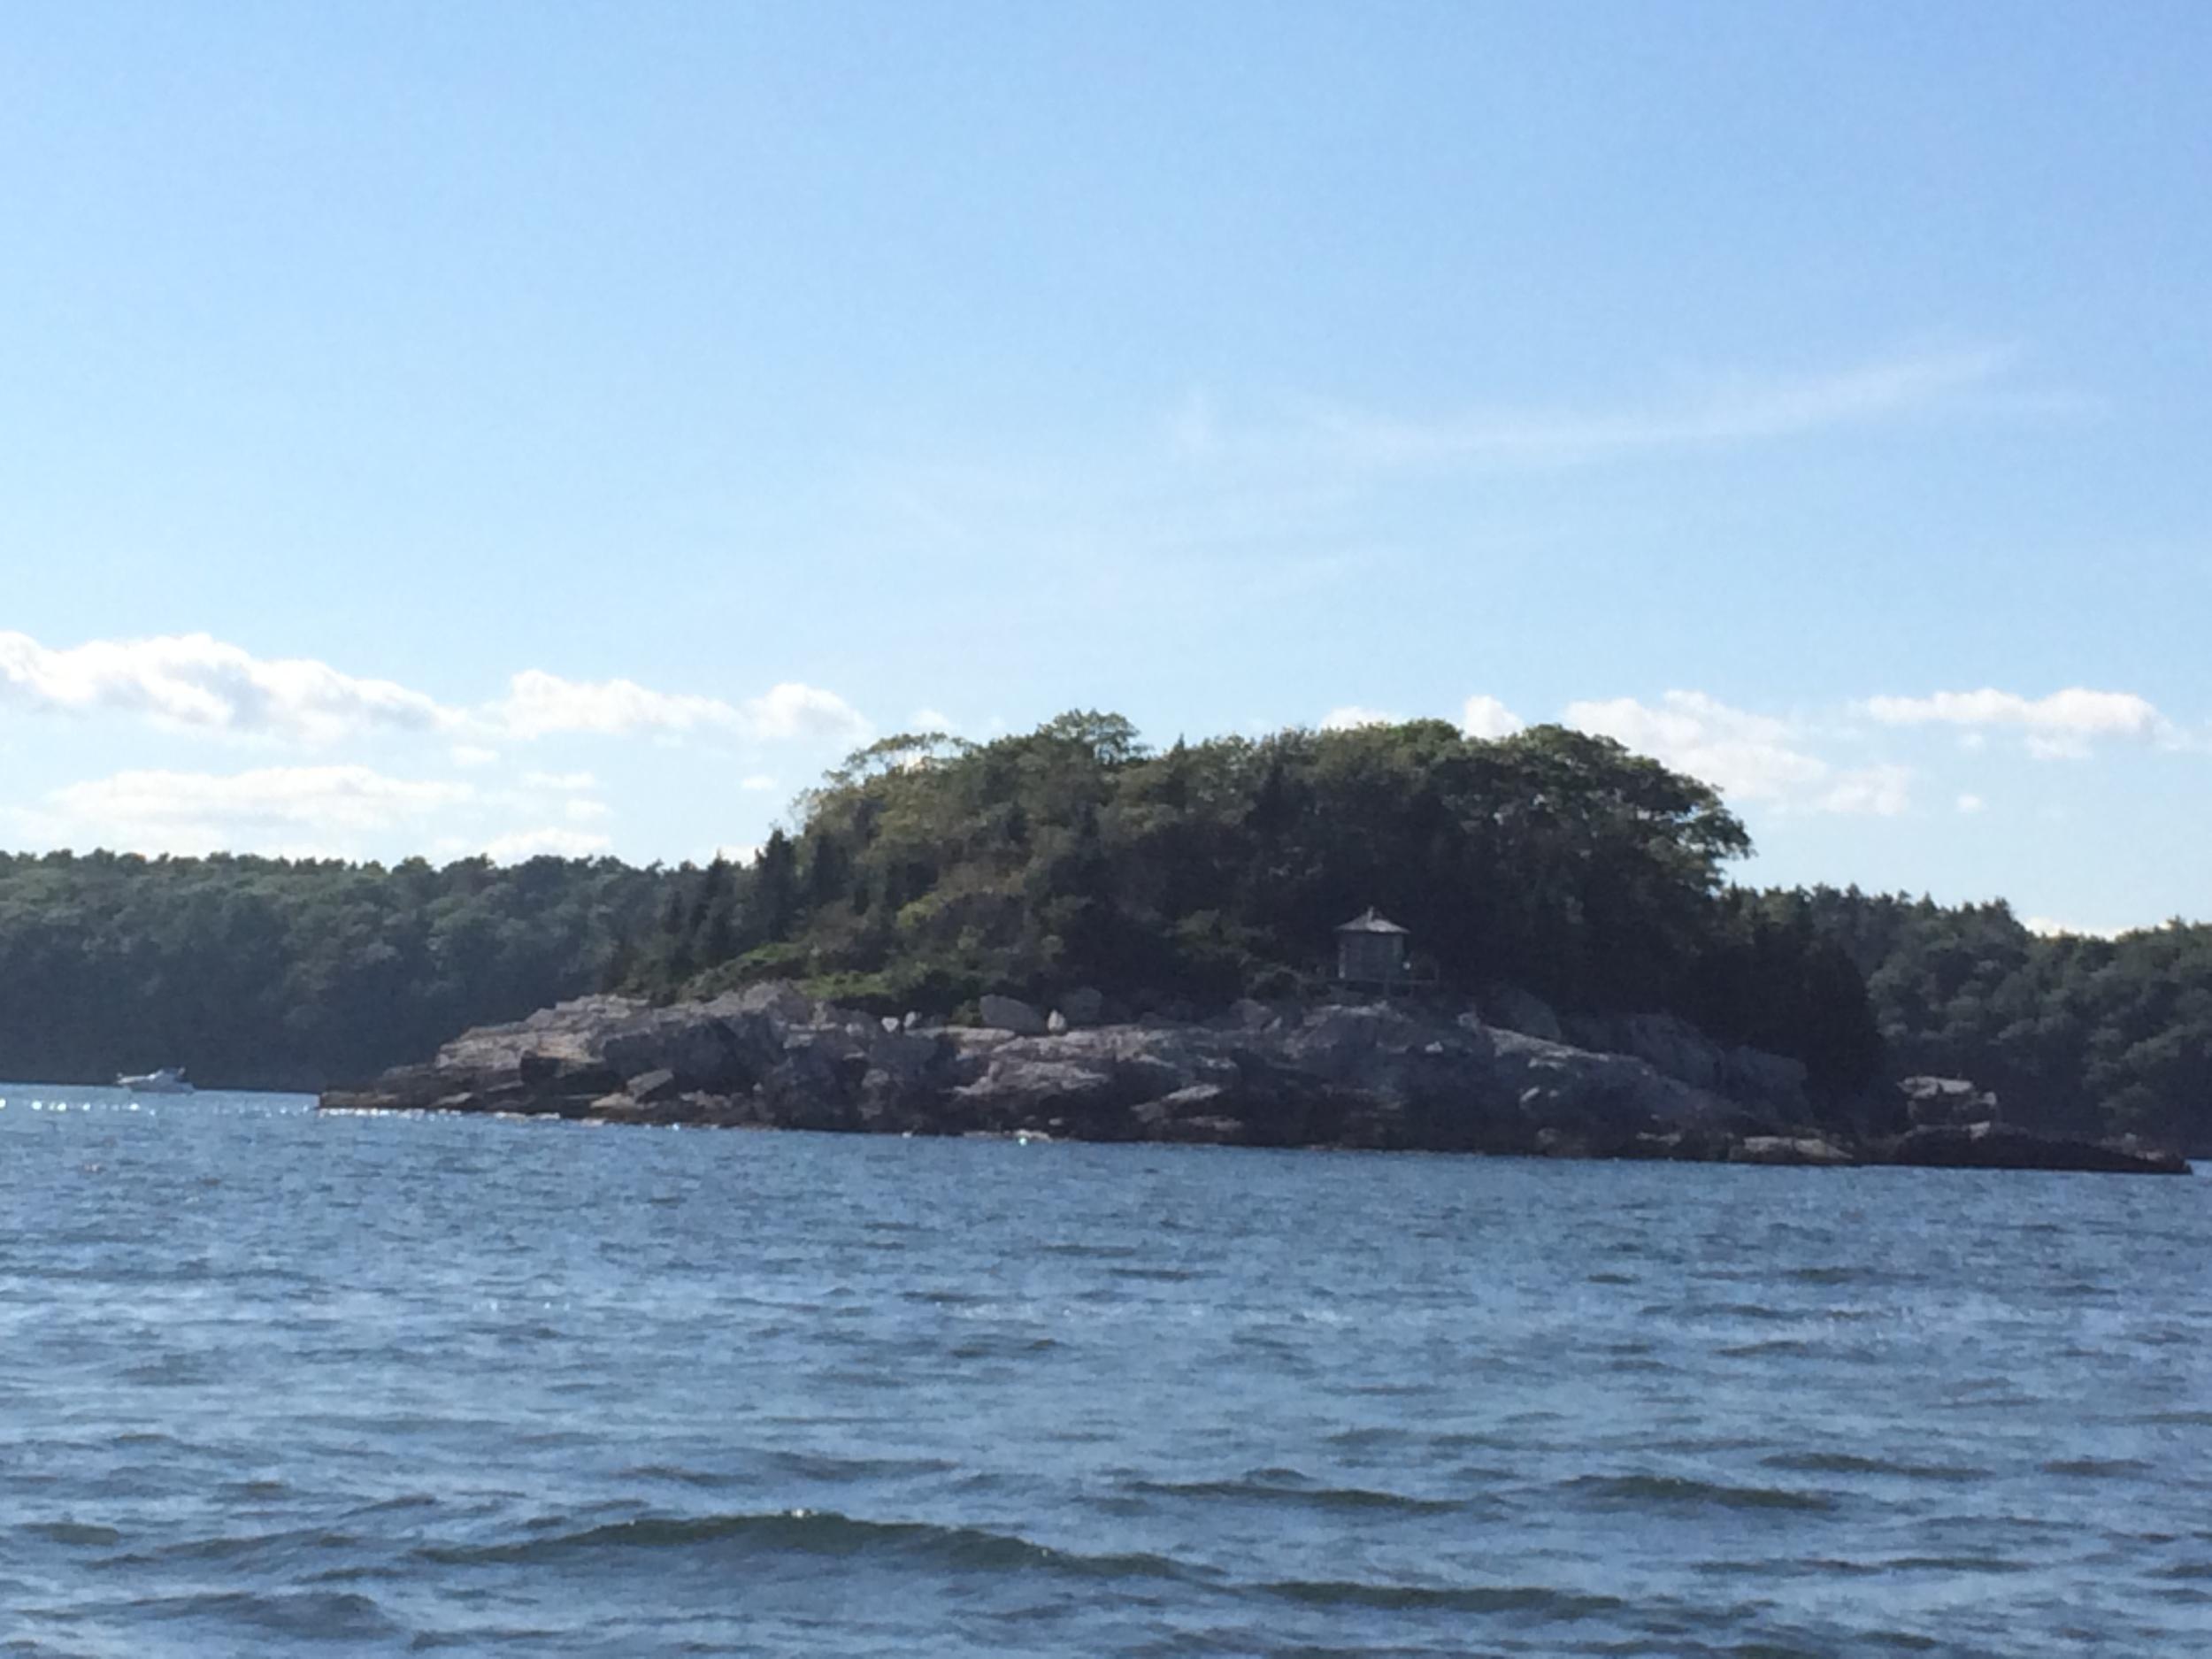 """Pumpkin Knob"" an island in Casco Bay off of Peaks Island"